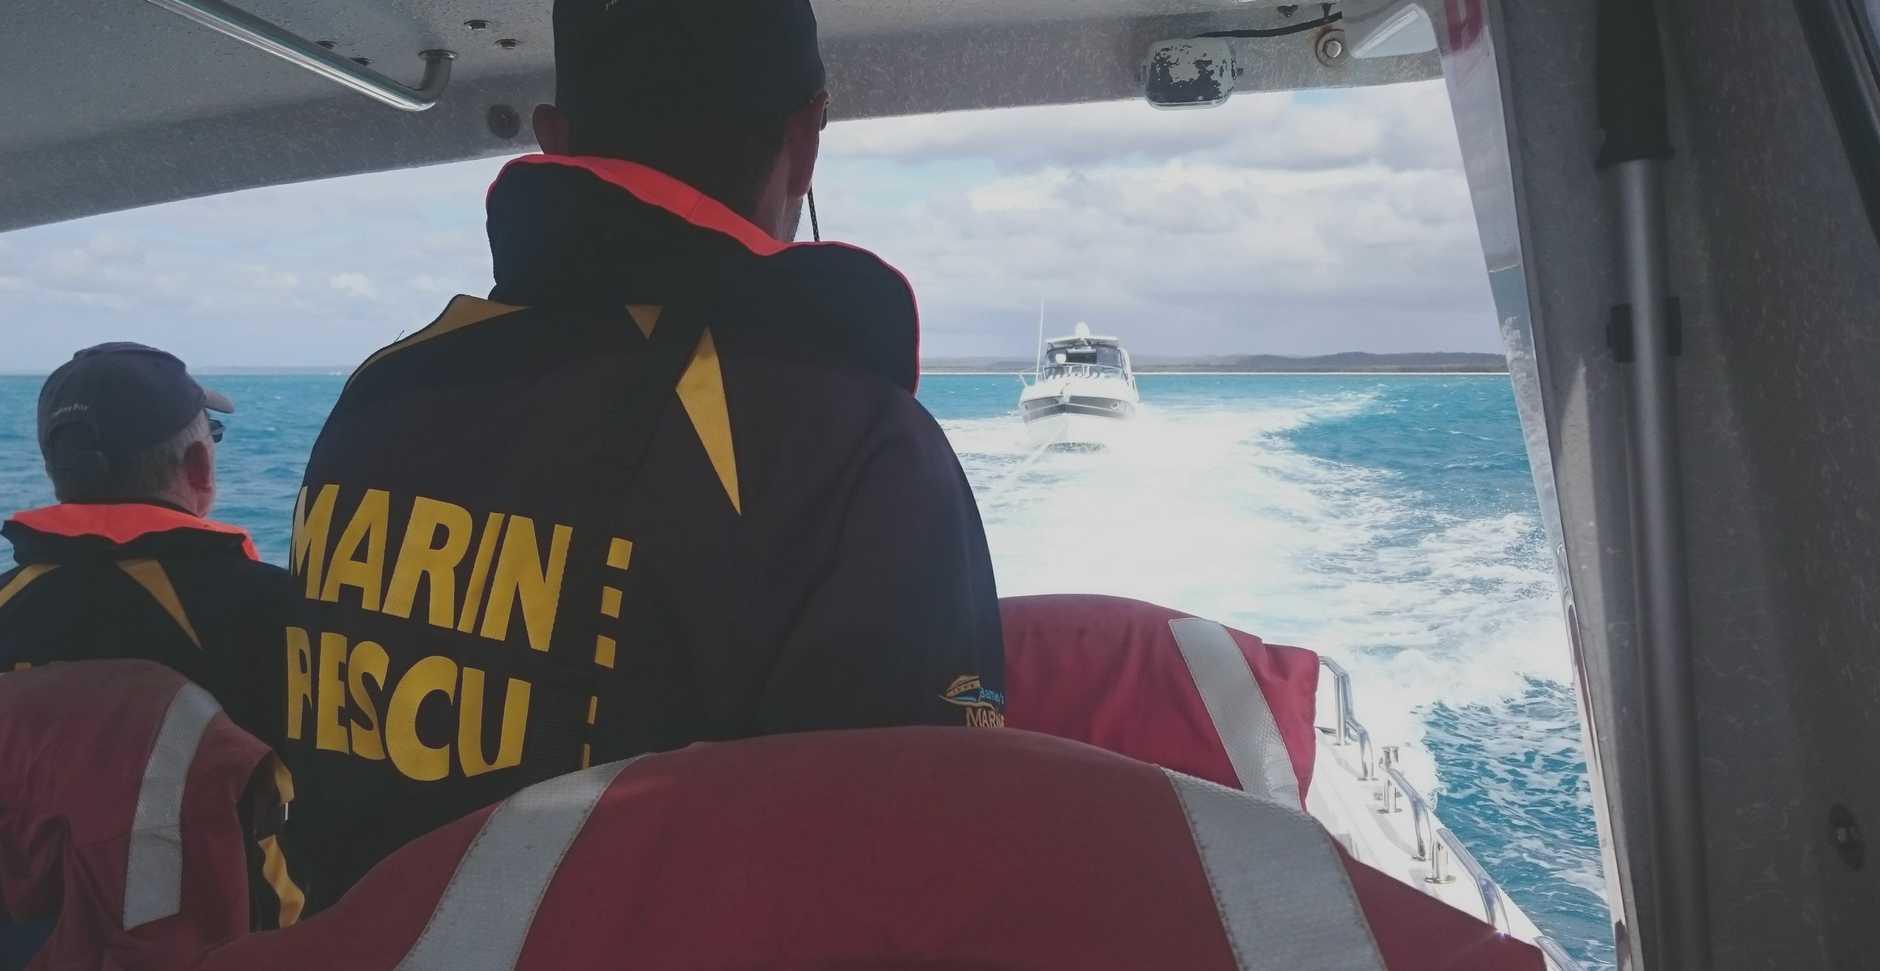 Volunteer Marine Rescue had a relatively quiet Christmas weekend.